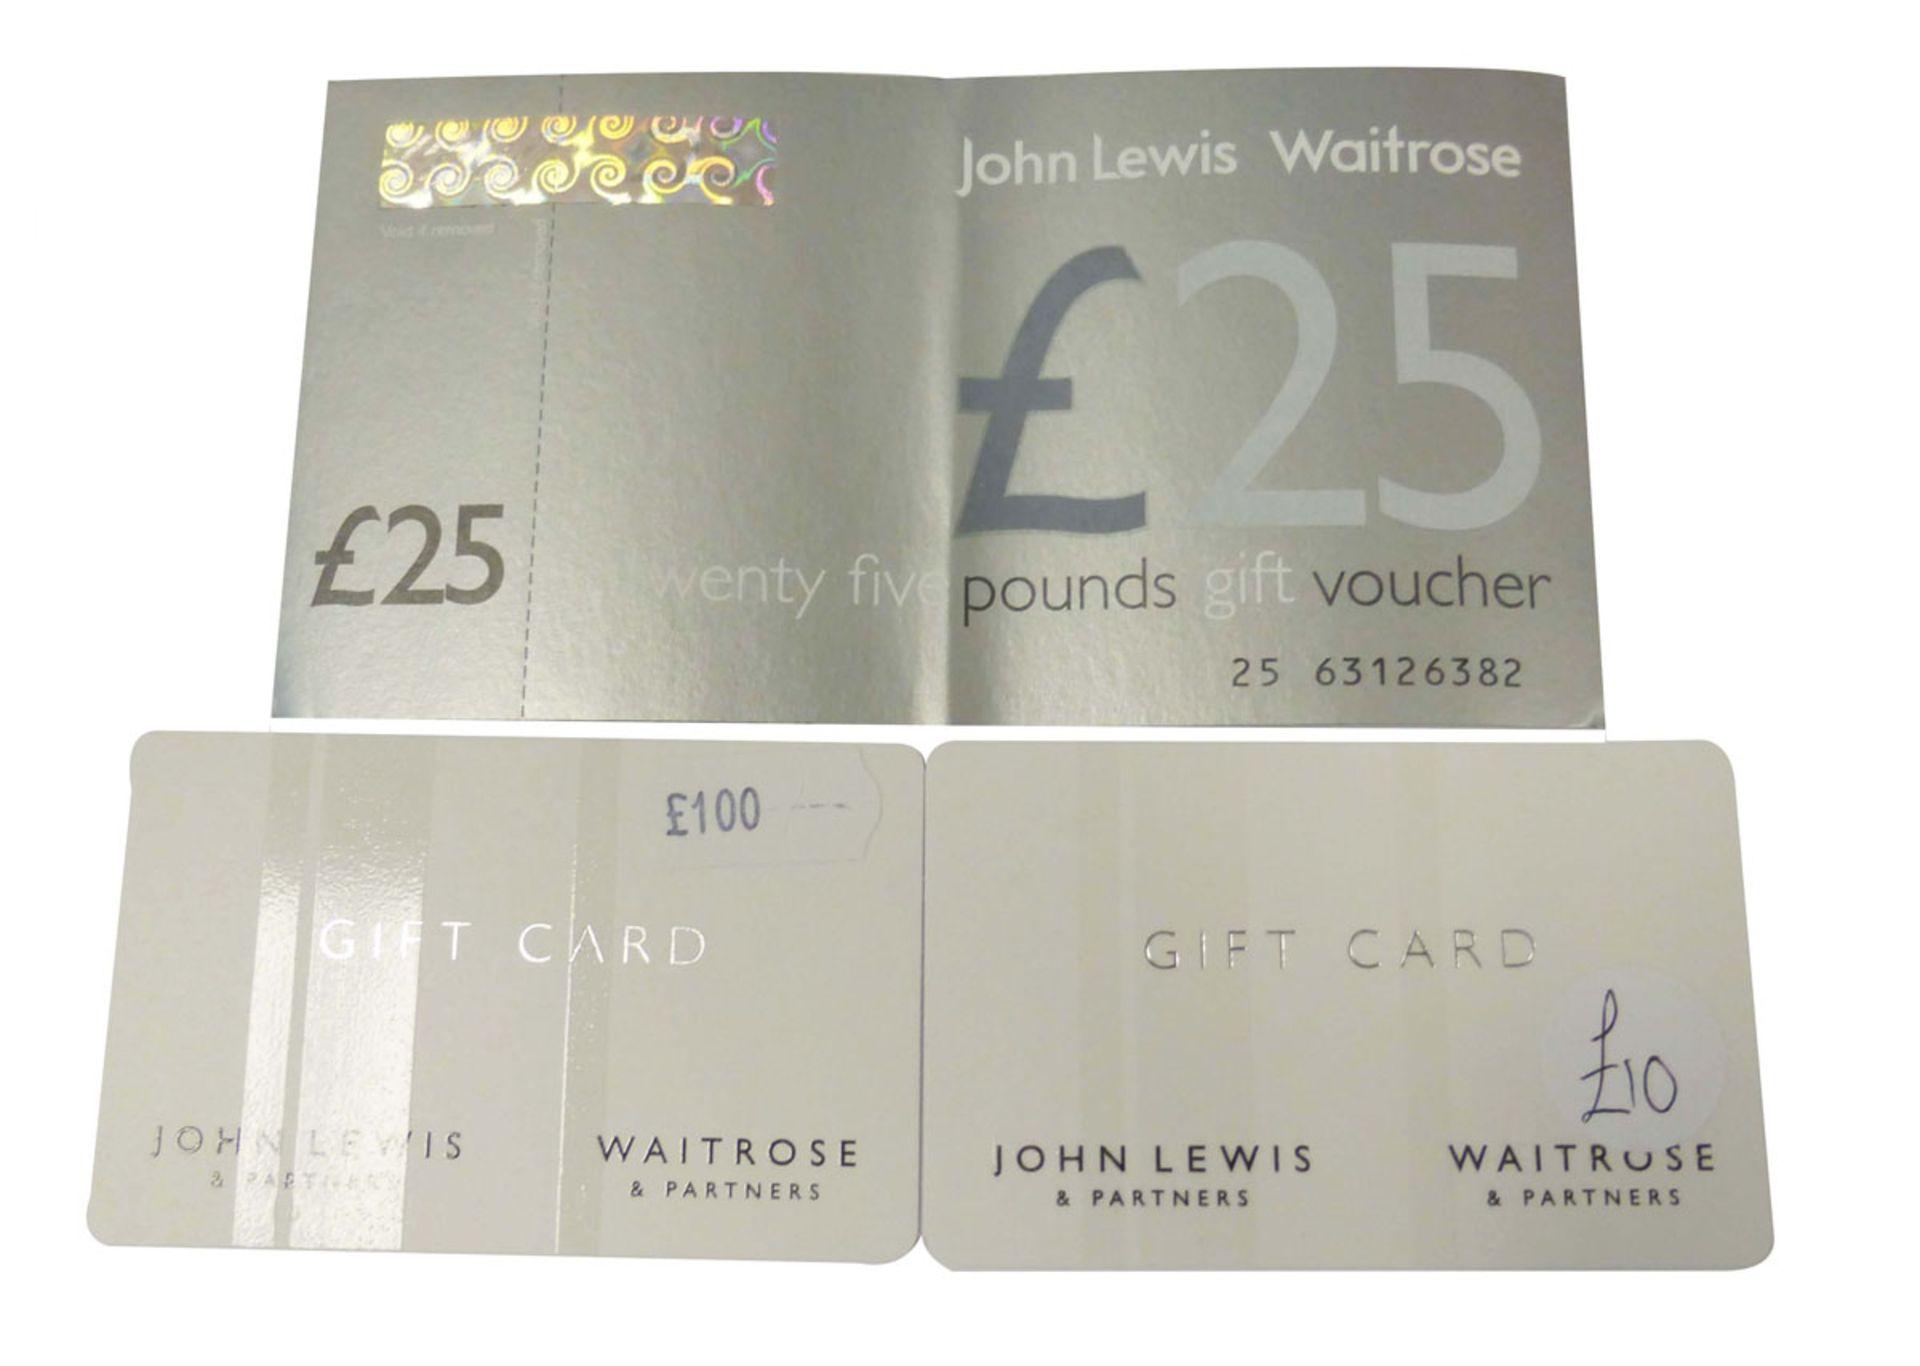 John Lewis (x3) - Total face value £135